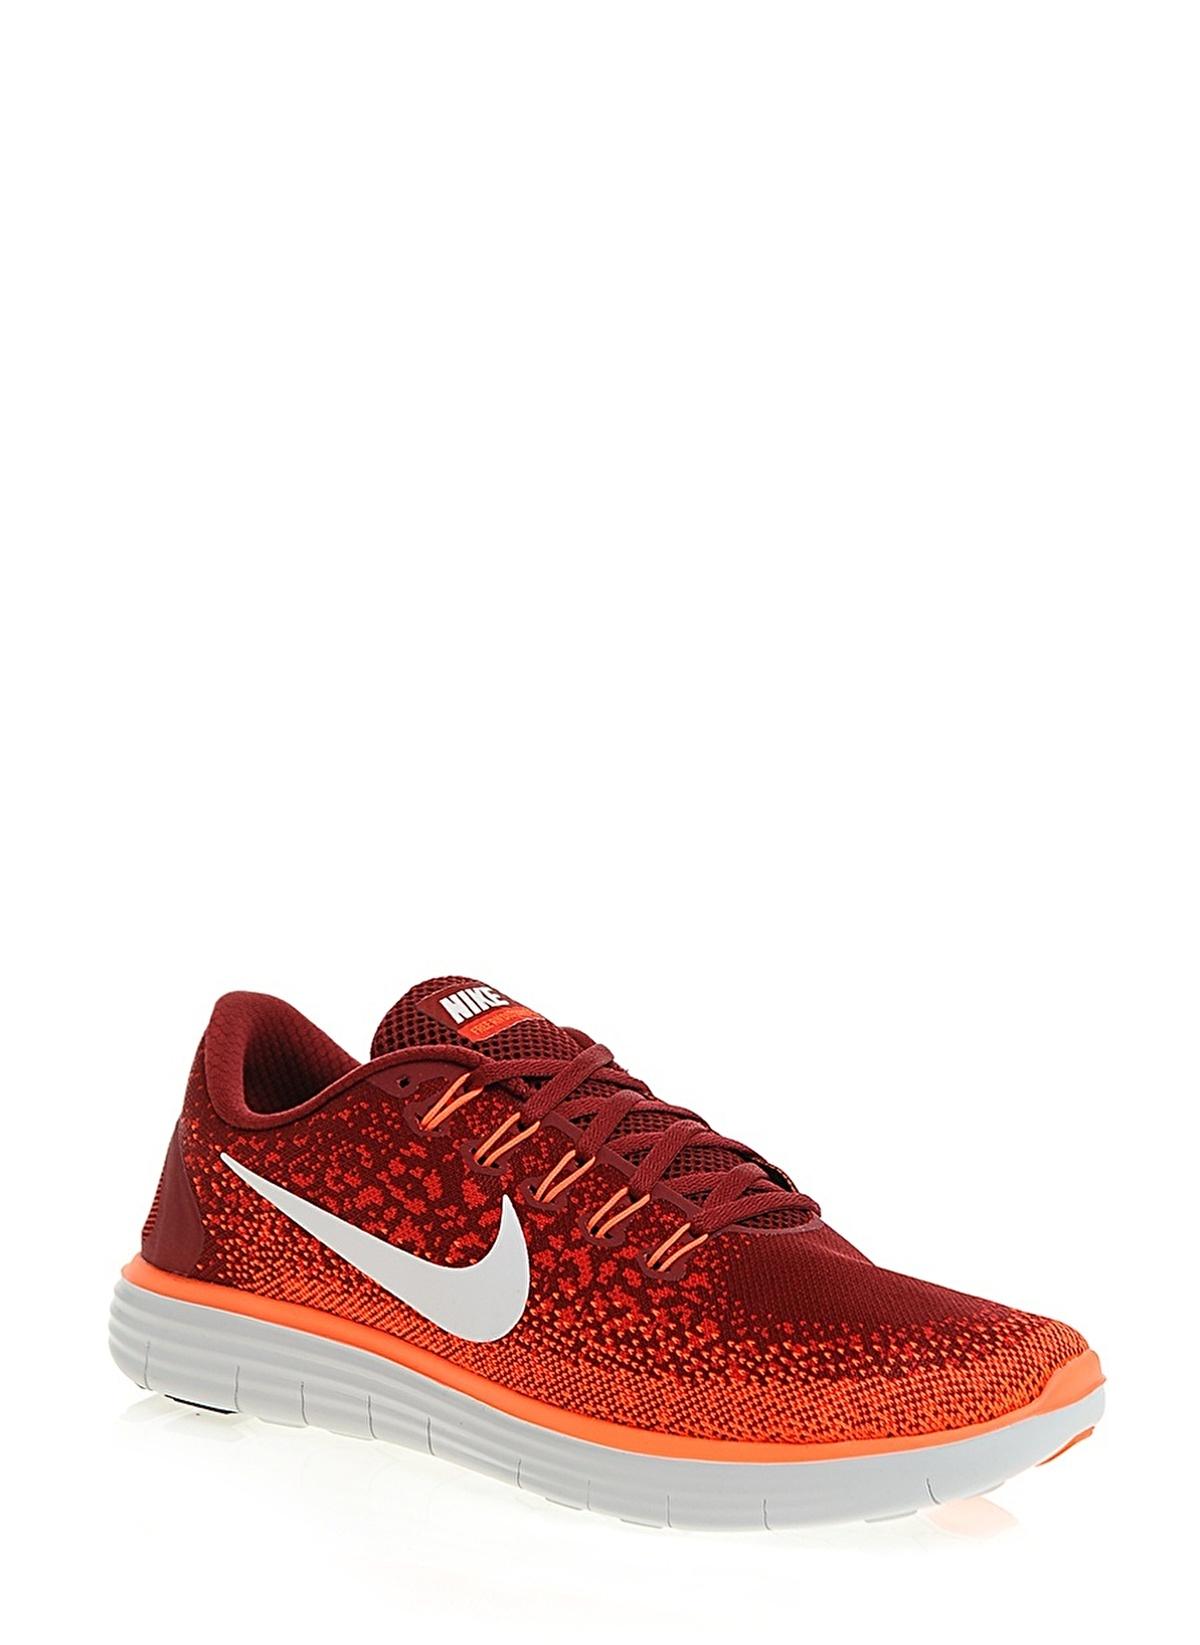 7725bc39d46 Nike Erkek Nike Free Rn Distance Team Red Off White-University ...